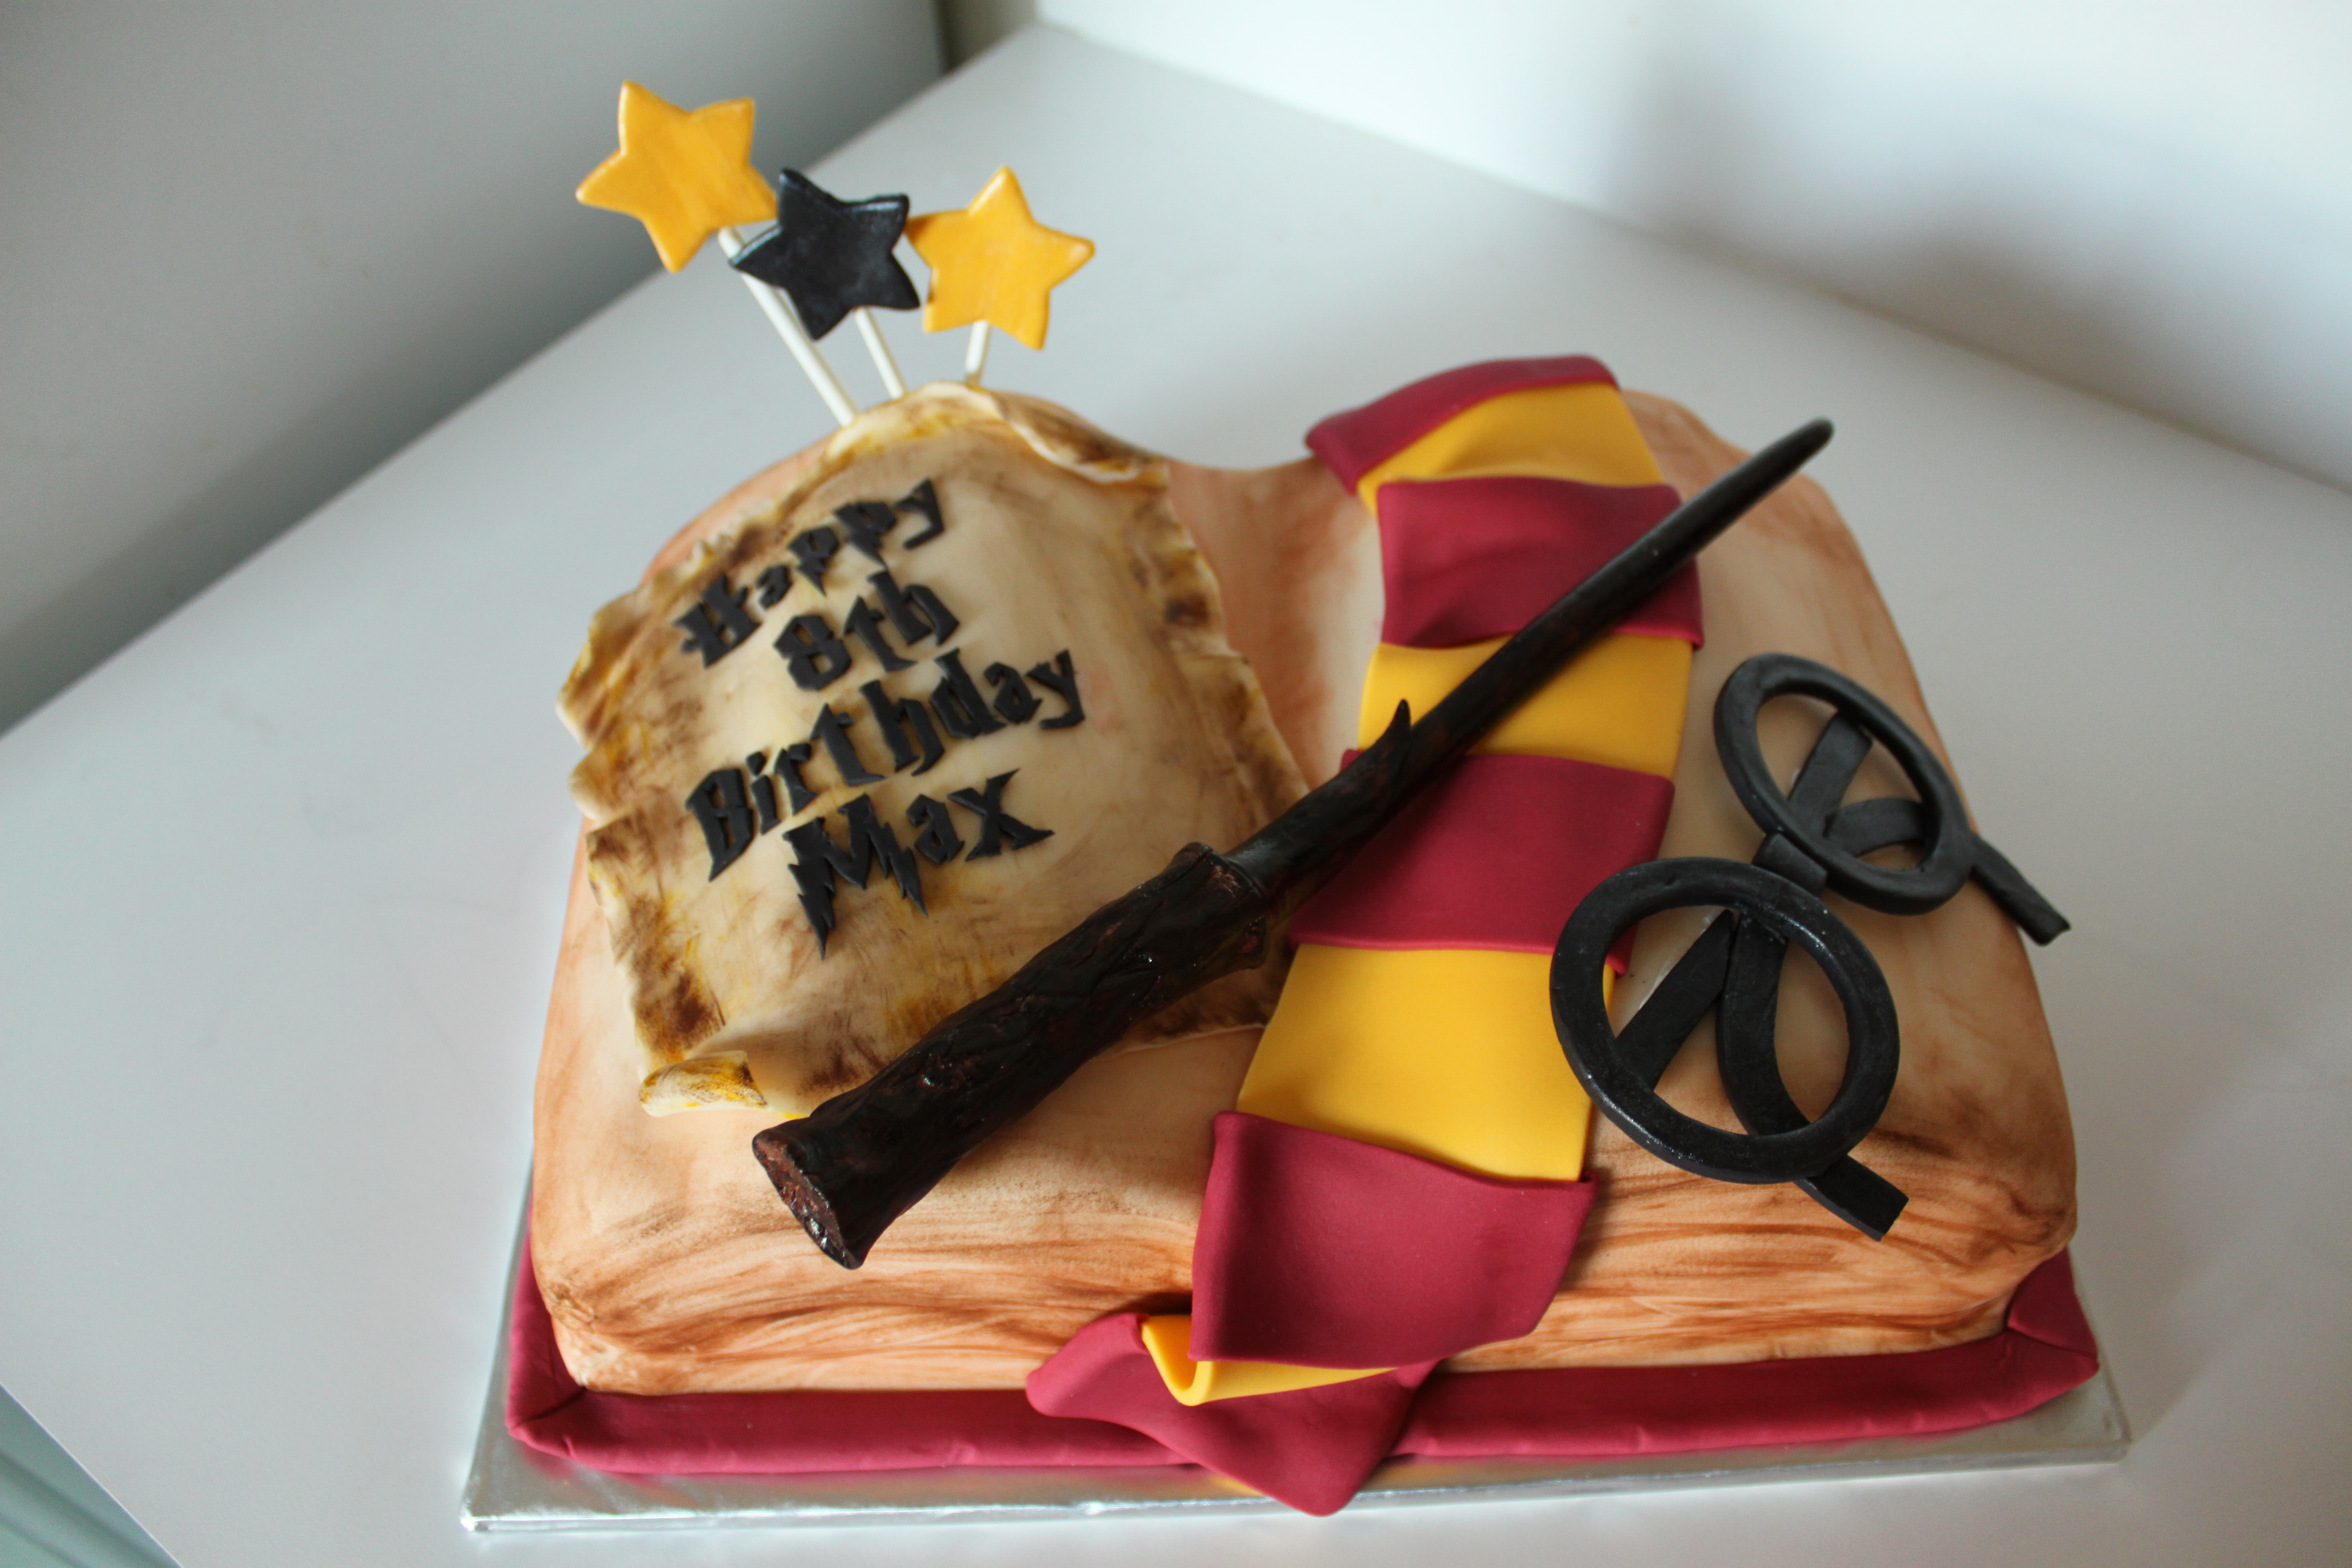 Stupendous Harry Potter Birthday Cake Lil Miss Cakes Funny Birthday Cards Online Alyptdamsfinfo